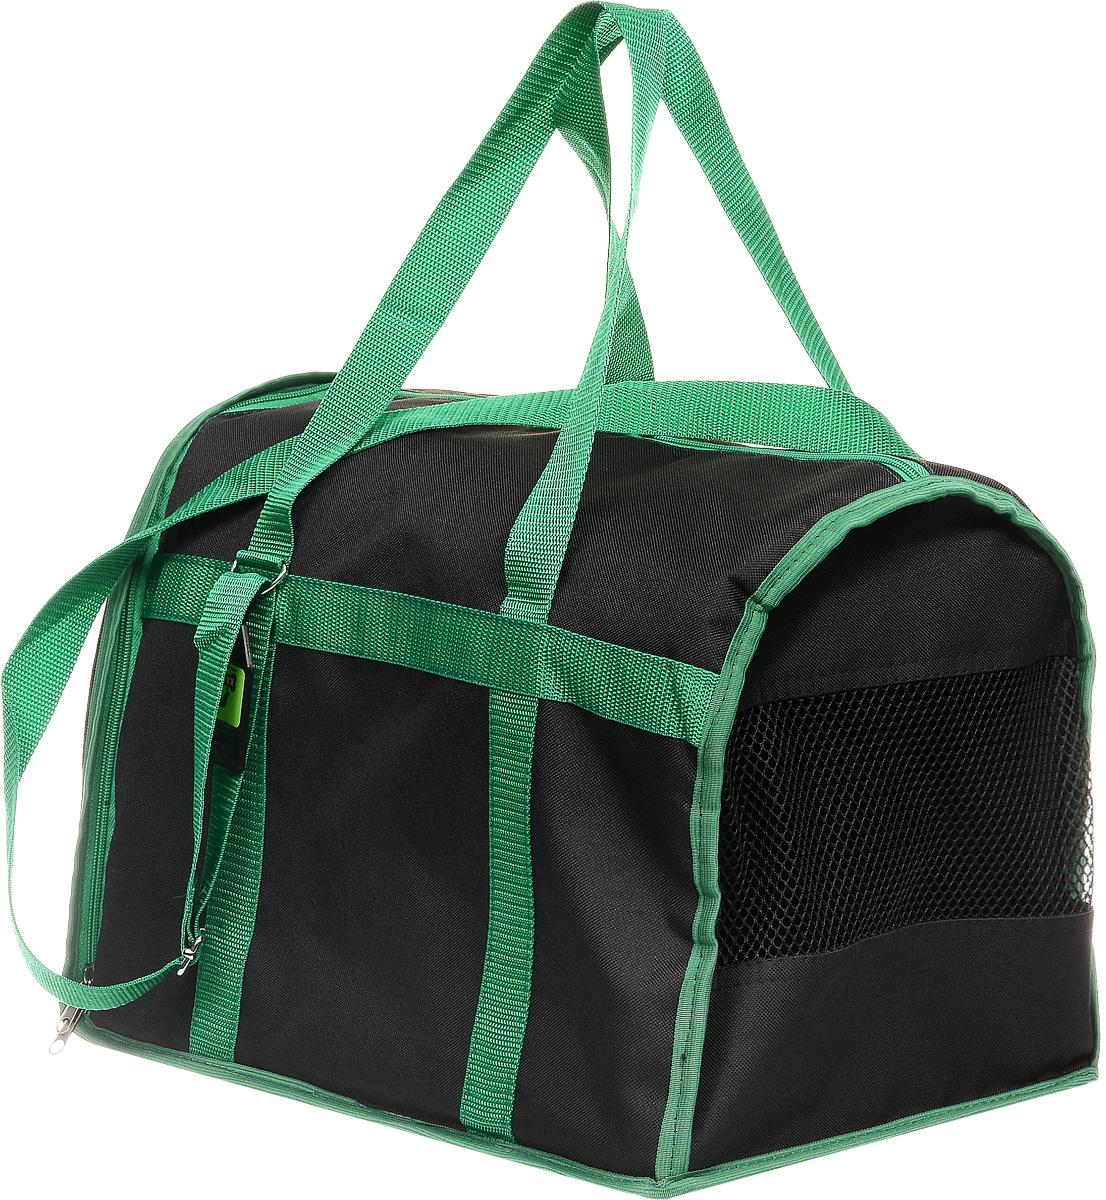 Сумка-переноска для животных Каскад Спорт, цвет: черный, зеленый, 40 х 28 х 29 см26000102_черный, зеленыйСумка-переноска для животных Каскад Спорт, цвет: черный, зеленый, 40 х 28 х 29 см